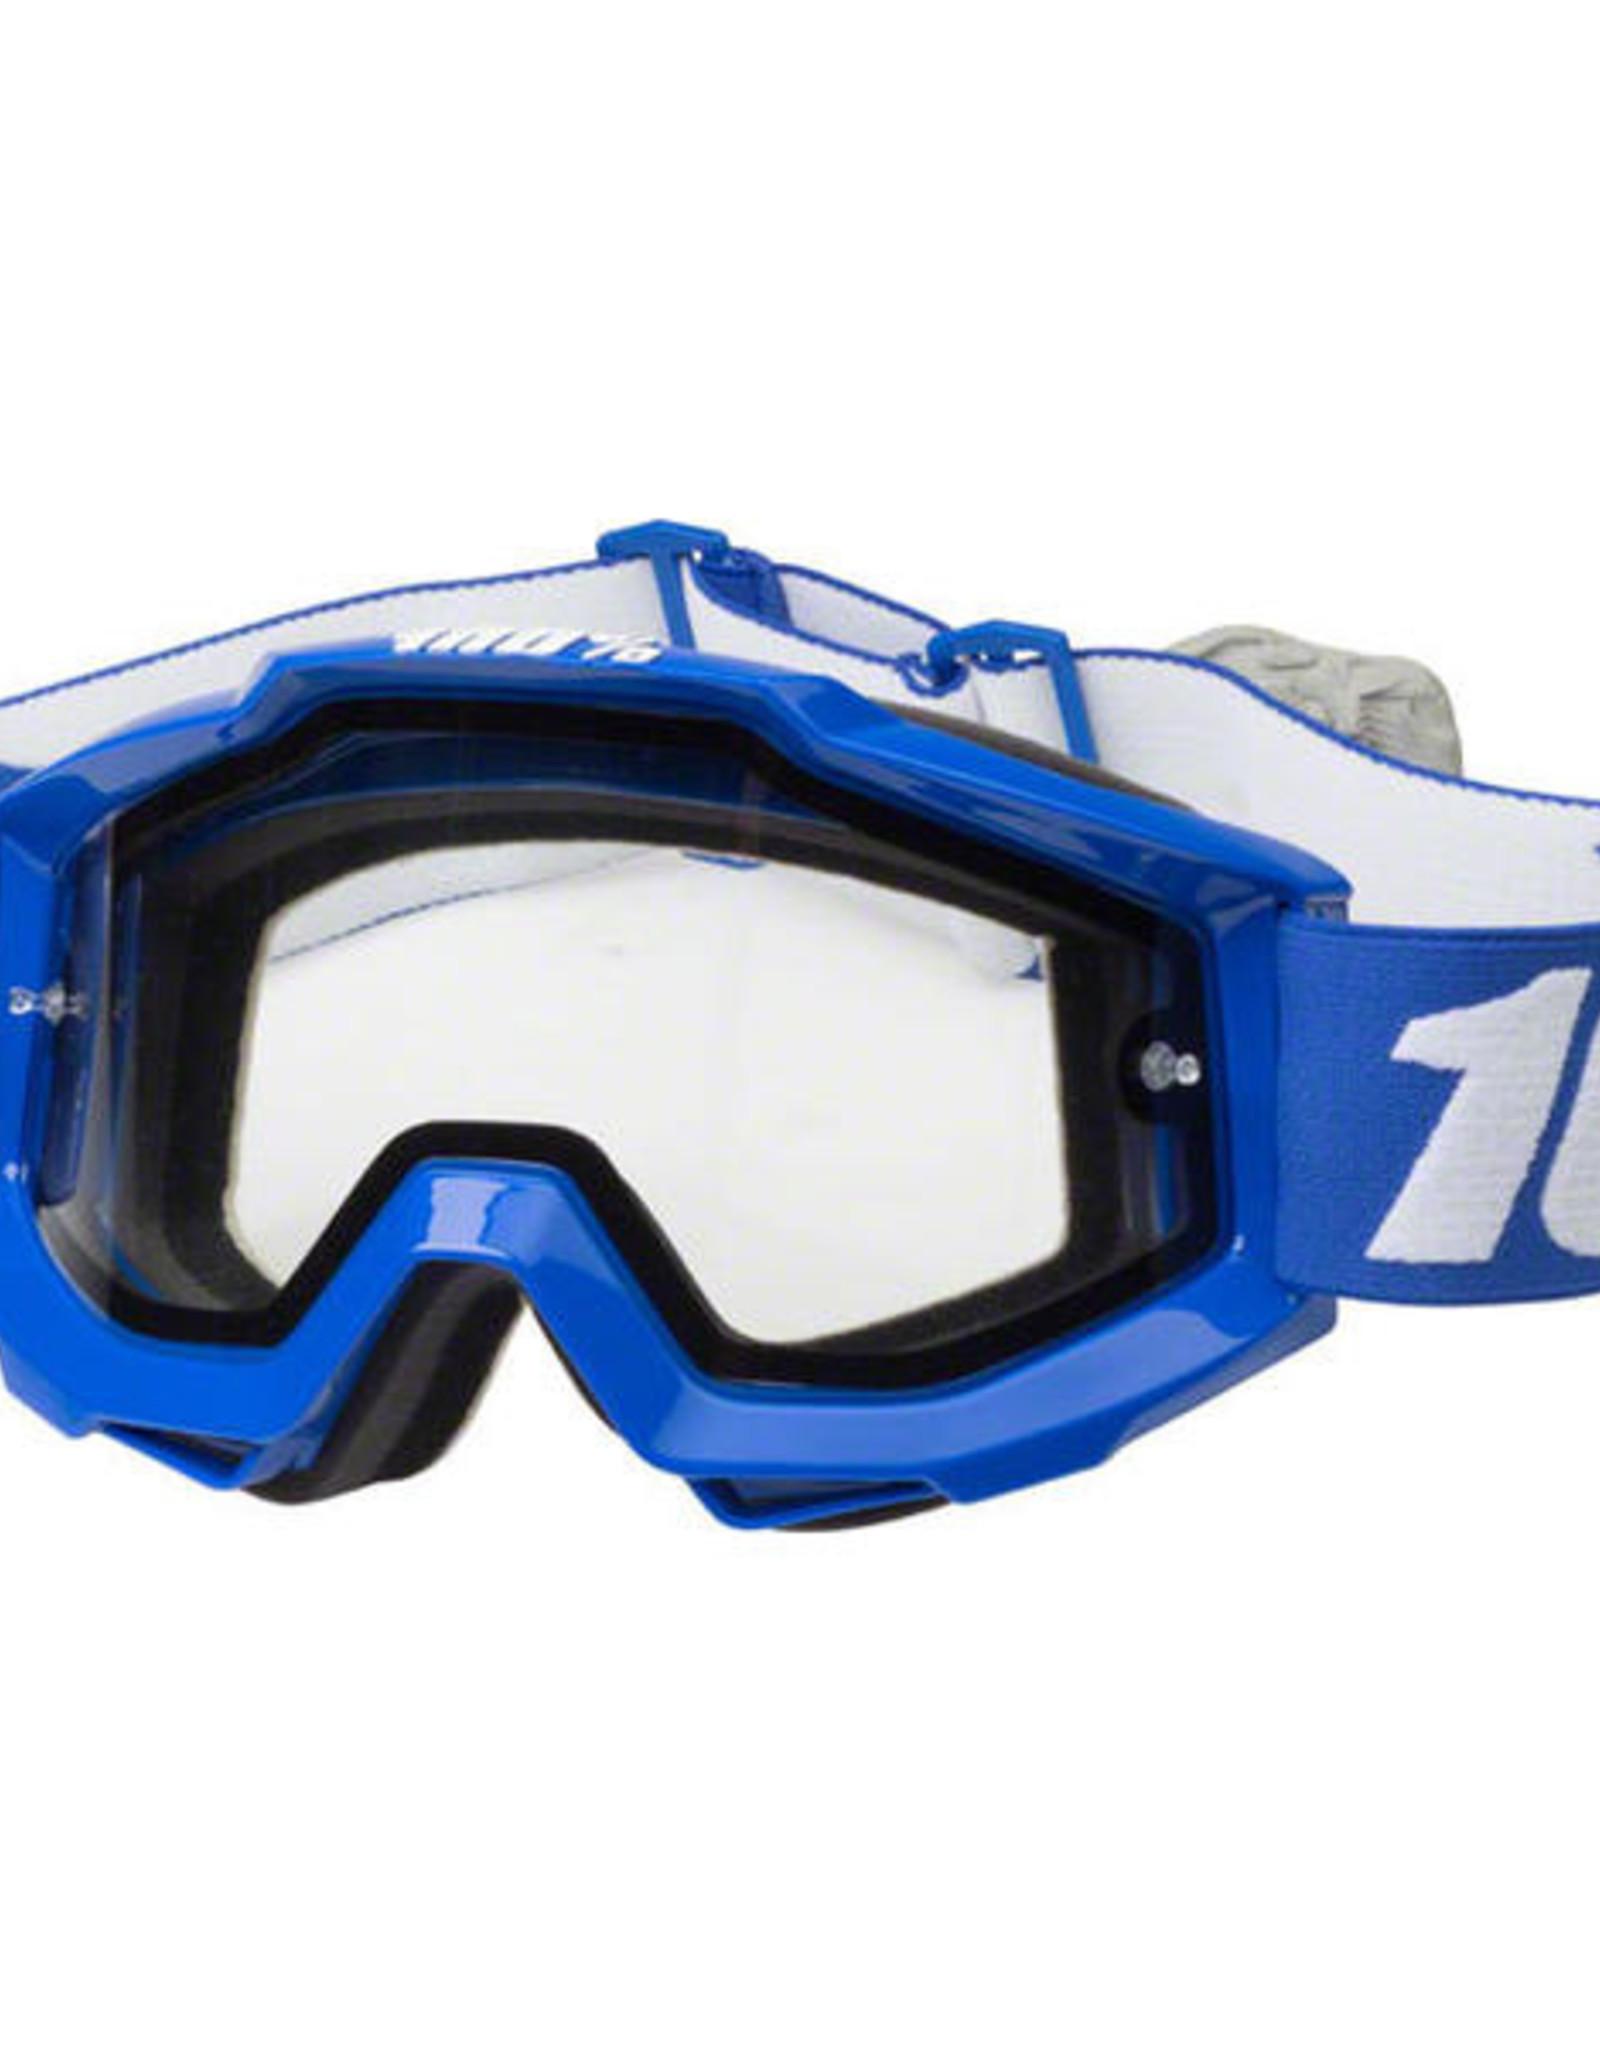 100% Accuri Enduro MTB Goggles, Blue